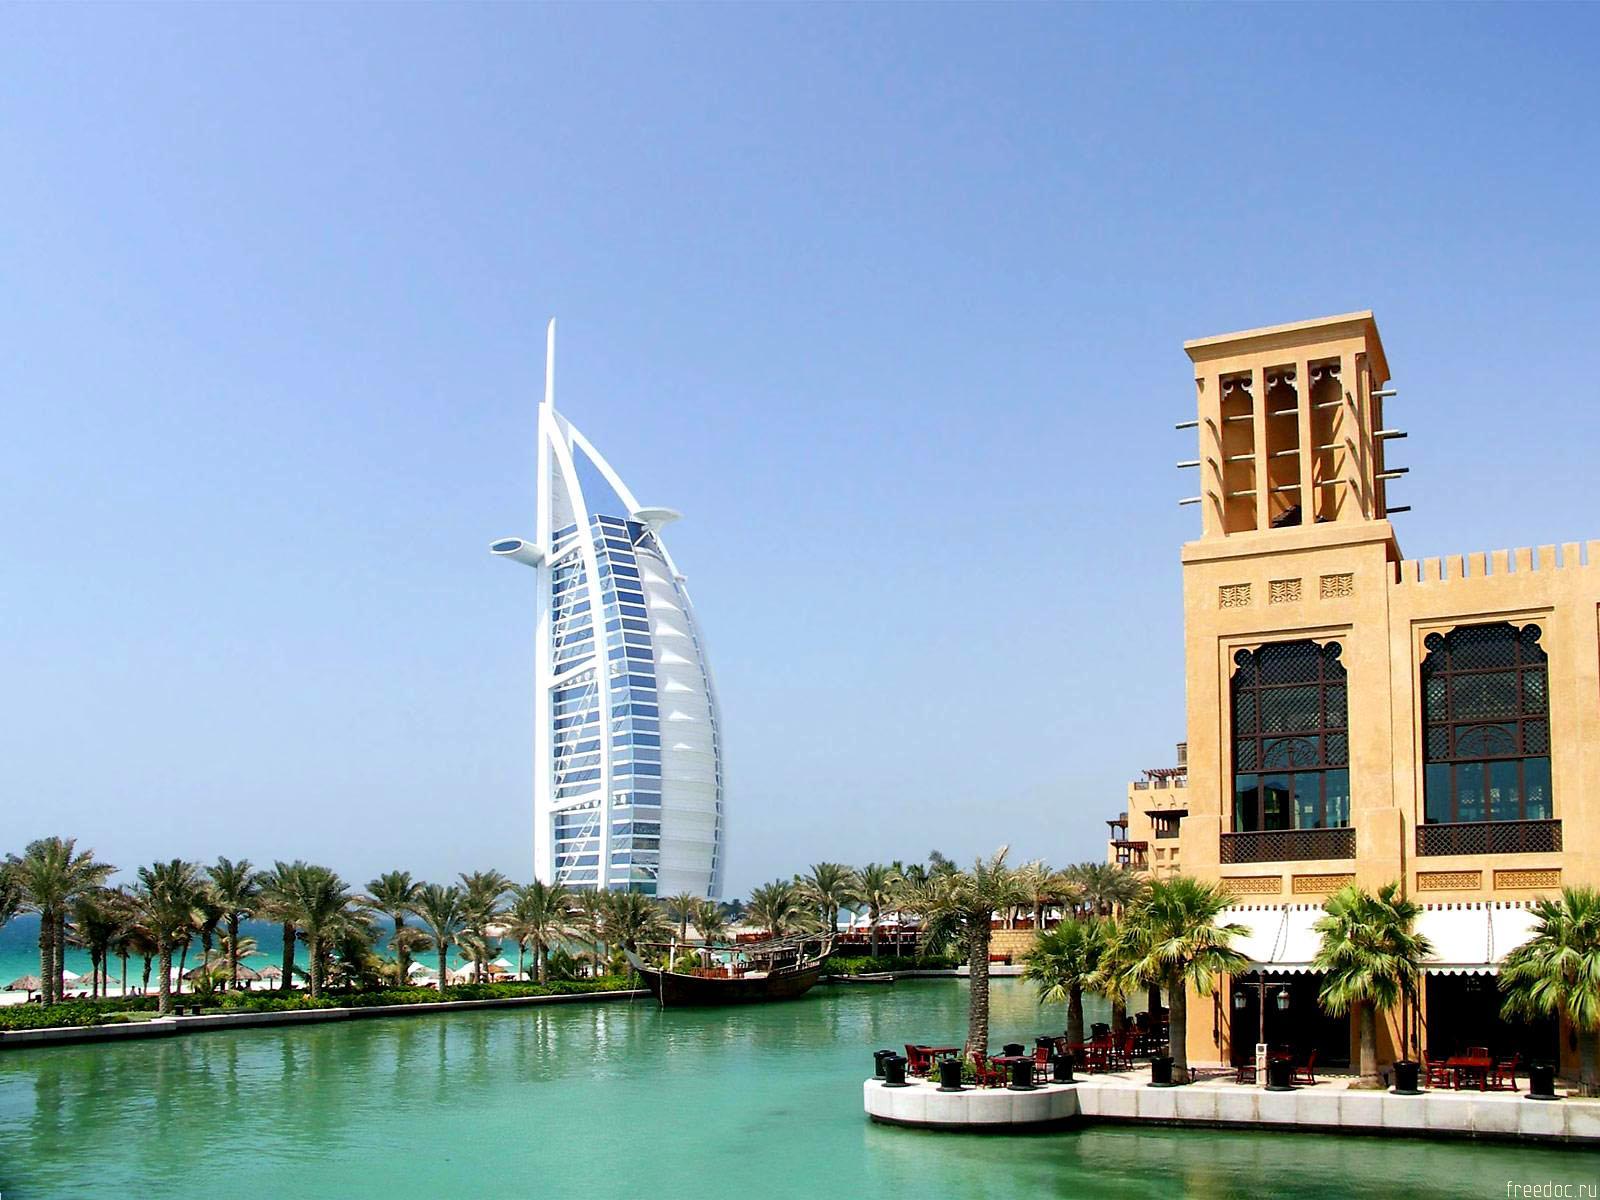 http://2.bp.blogspot.com/-HXDdDOJ697c/TWUYbVjFvhI/AAAAAAAAAdg/Su2Lf-ouH2Y/s1600/Dubai-view-Wallpaper.jpg